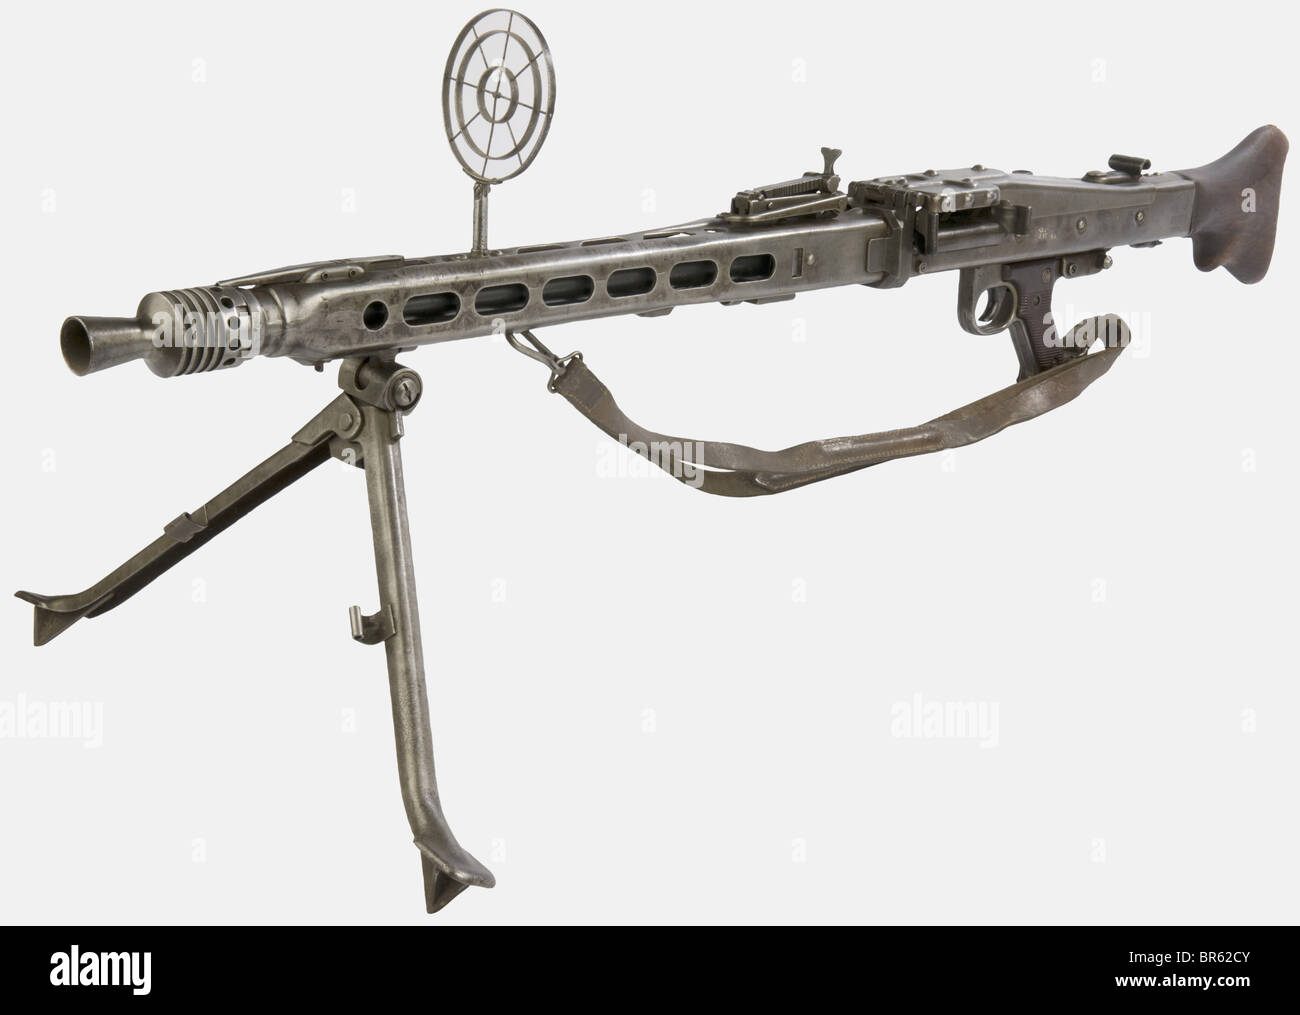 a german mg 42 machine gun stock photos a german mg 42 machine gun stock images alamy. Black Bedroom Furniture Sets. Home Design Ideas